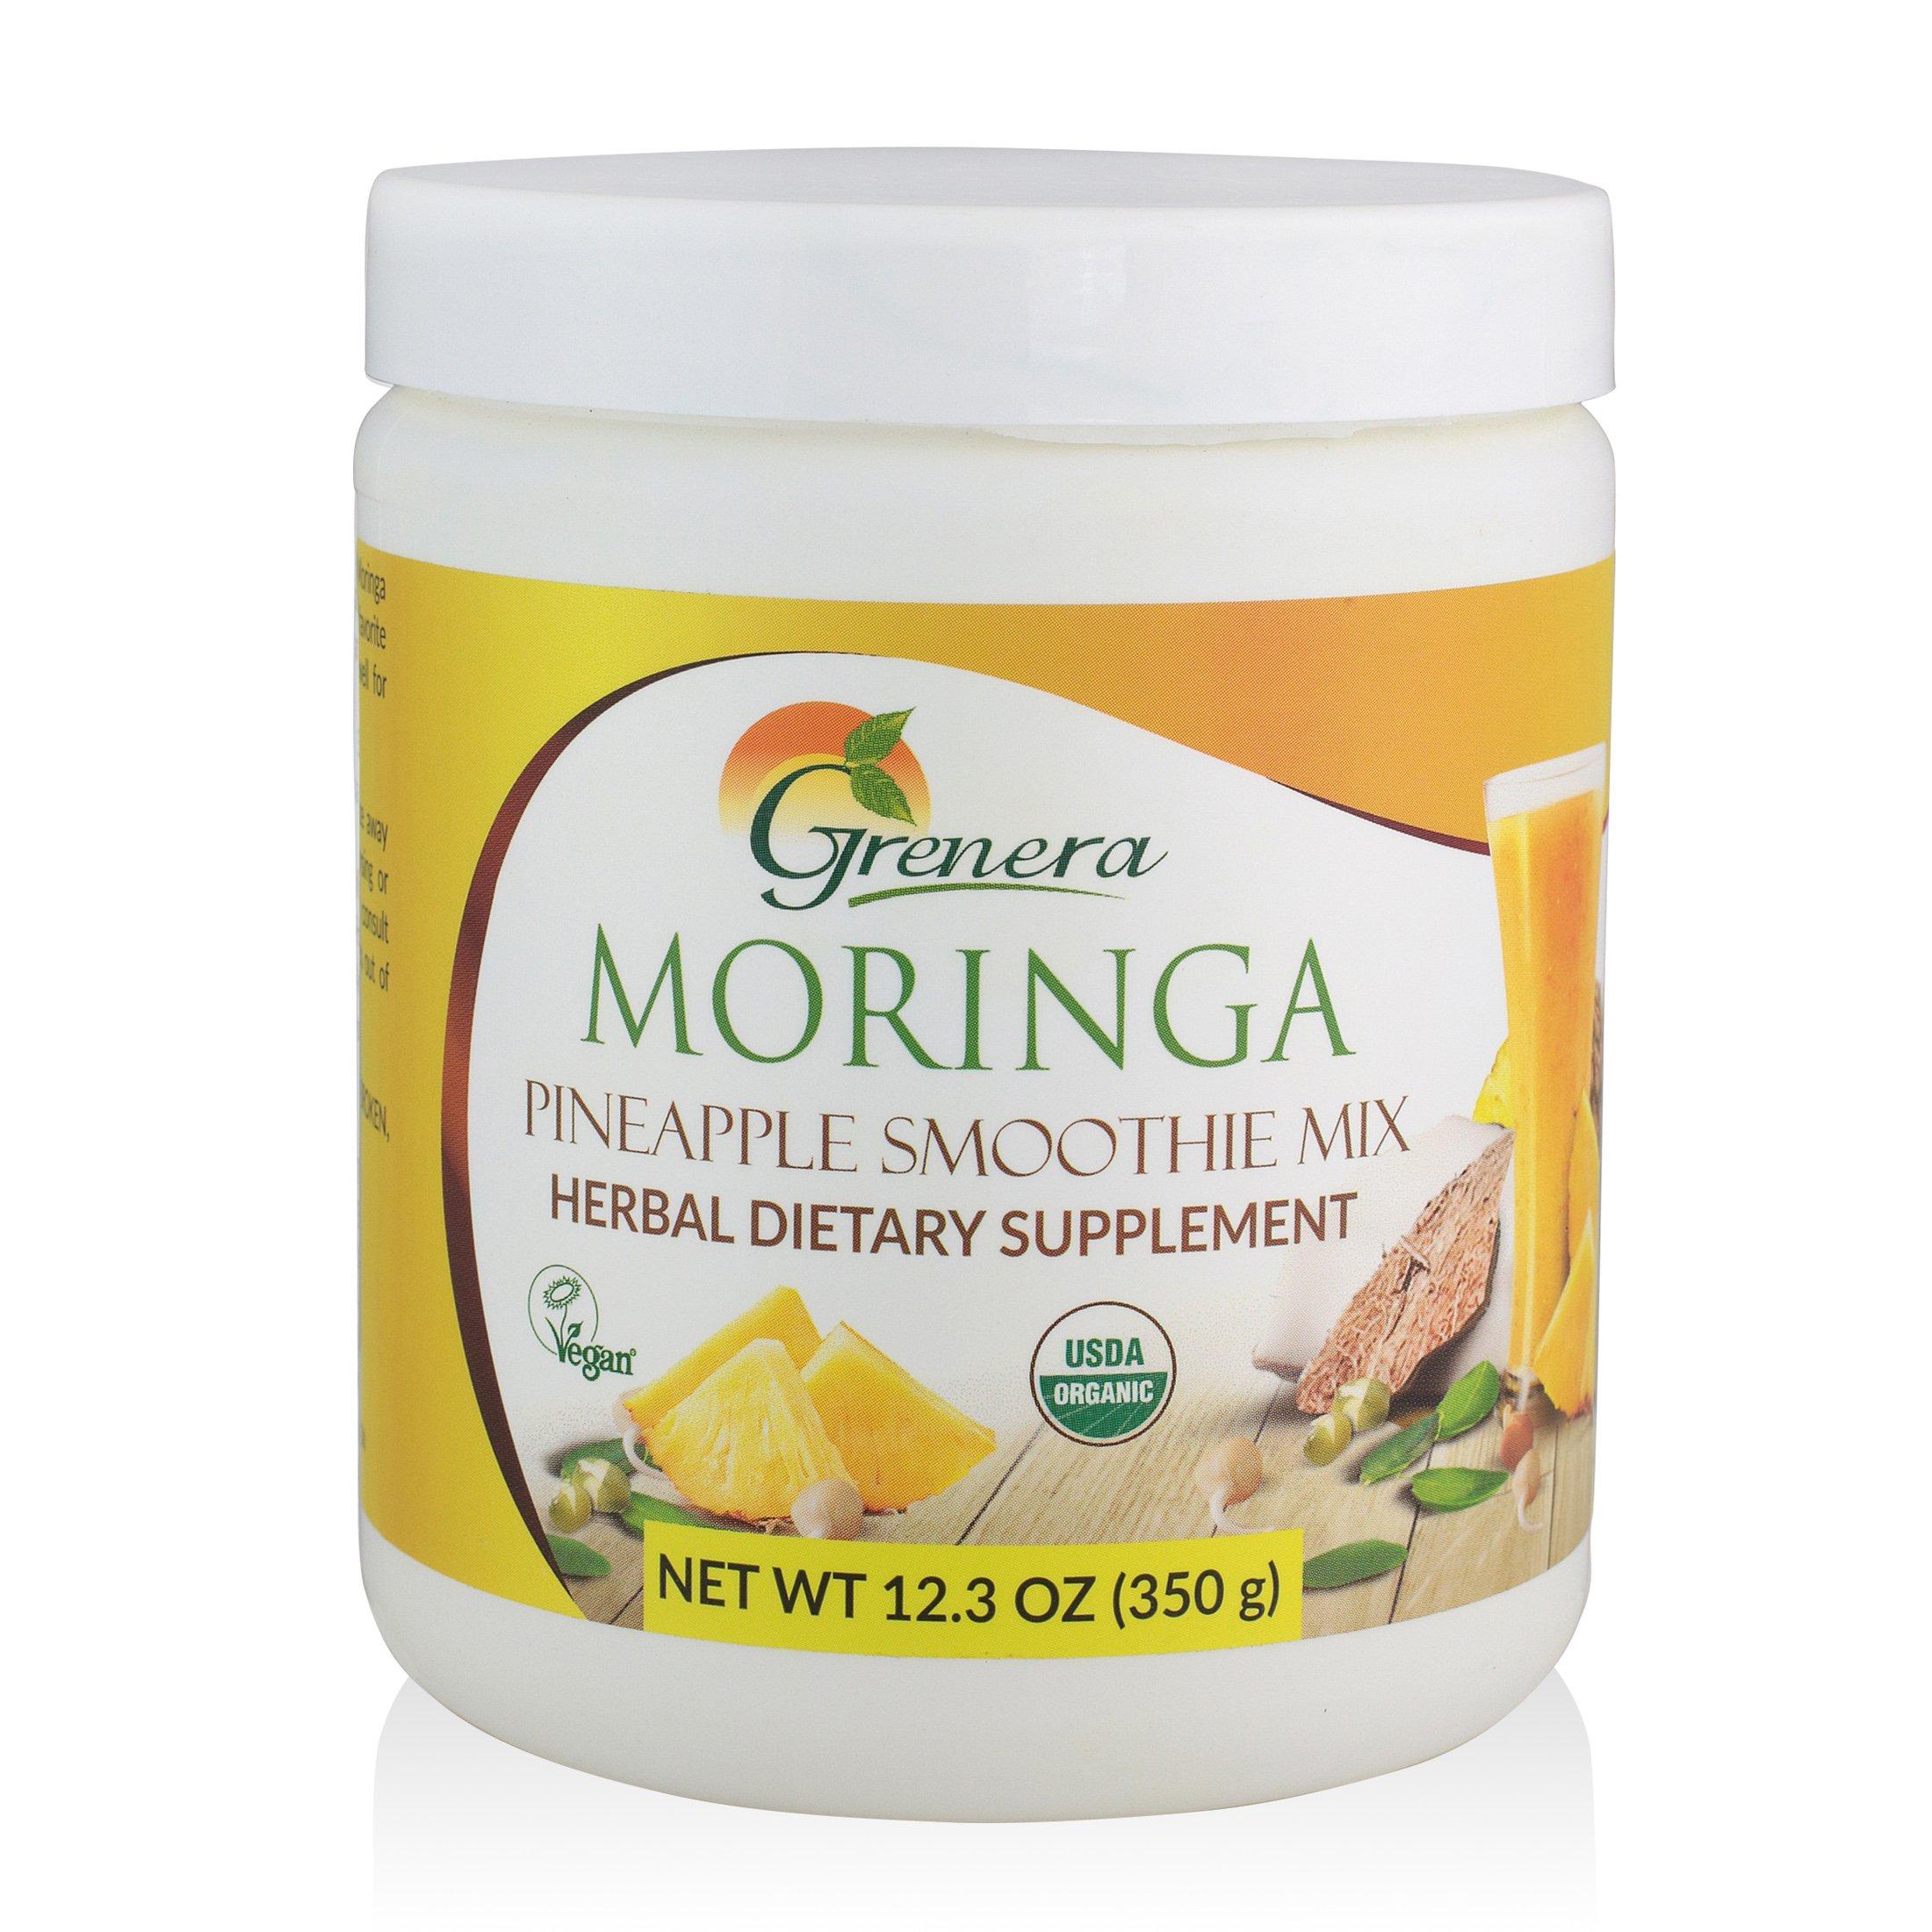 Grenera Organic Moringa Pineapple Smoothie Mix-12.3 ounce/ 350 gram -USDA Organic, Vegan, Kosher Certified